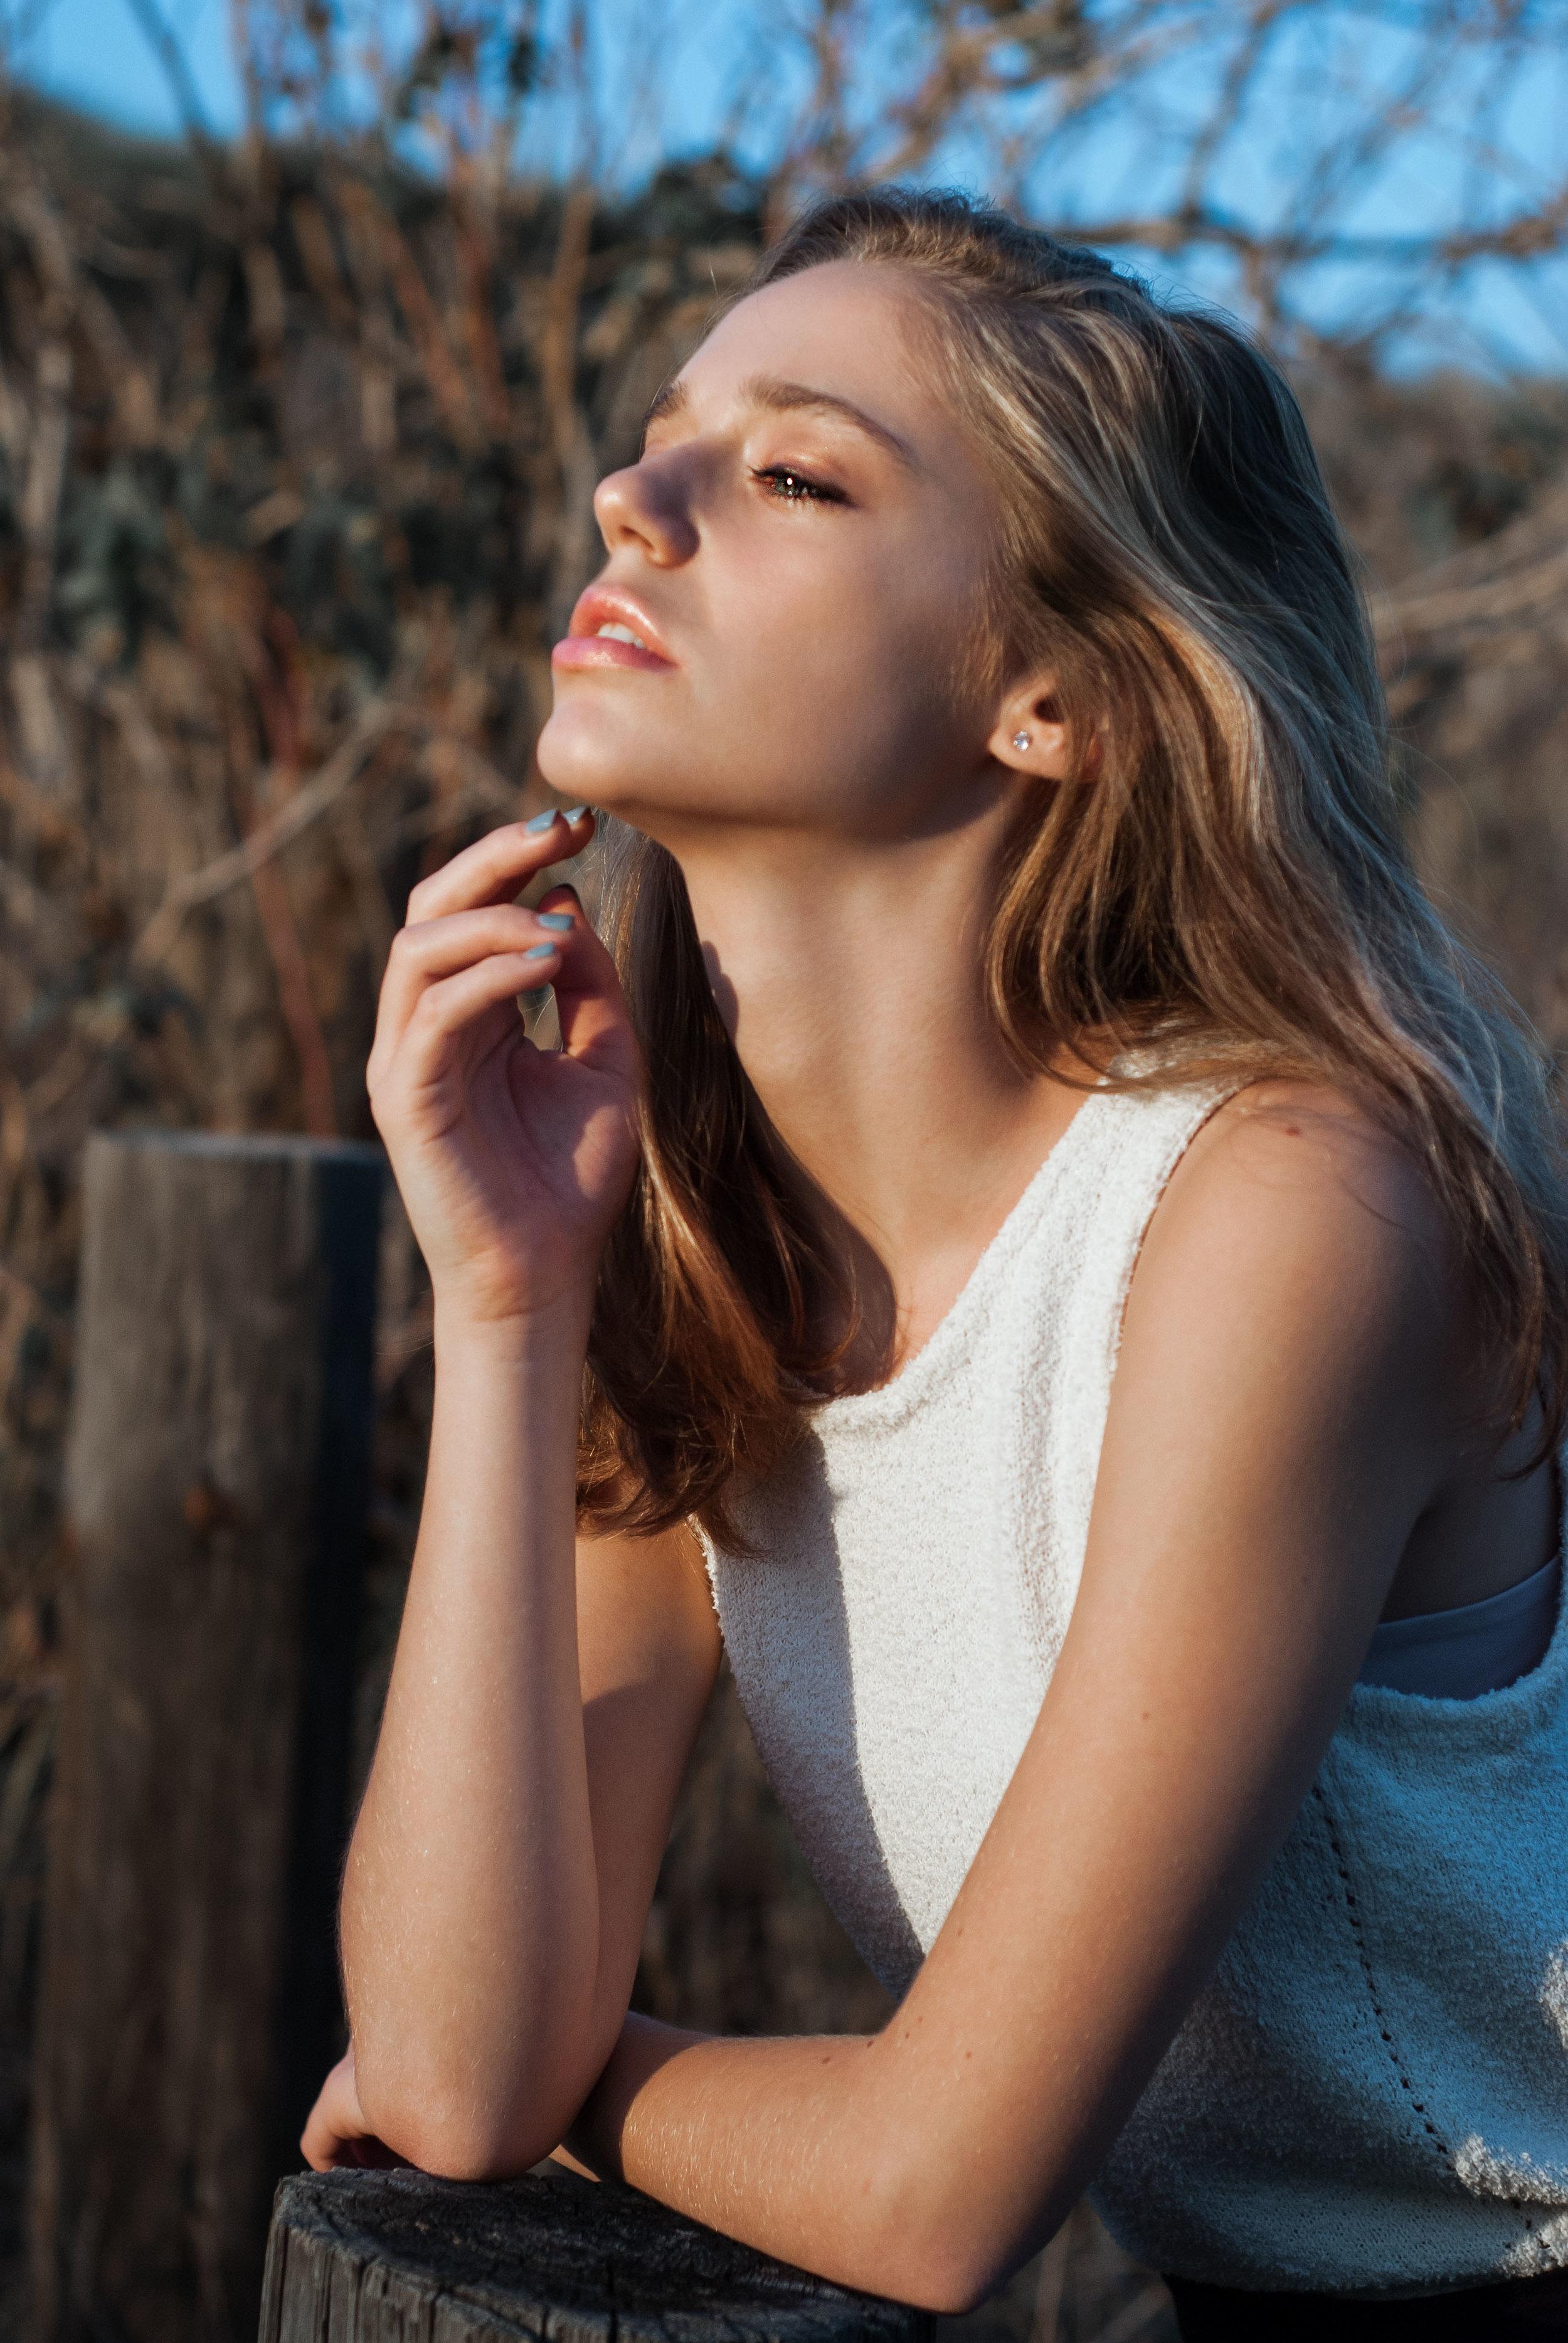 Model - Ravid Ronen  Photography&makeup - Lia Schon (me)